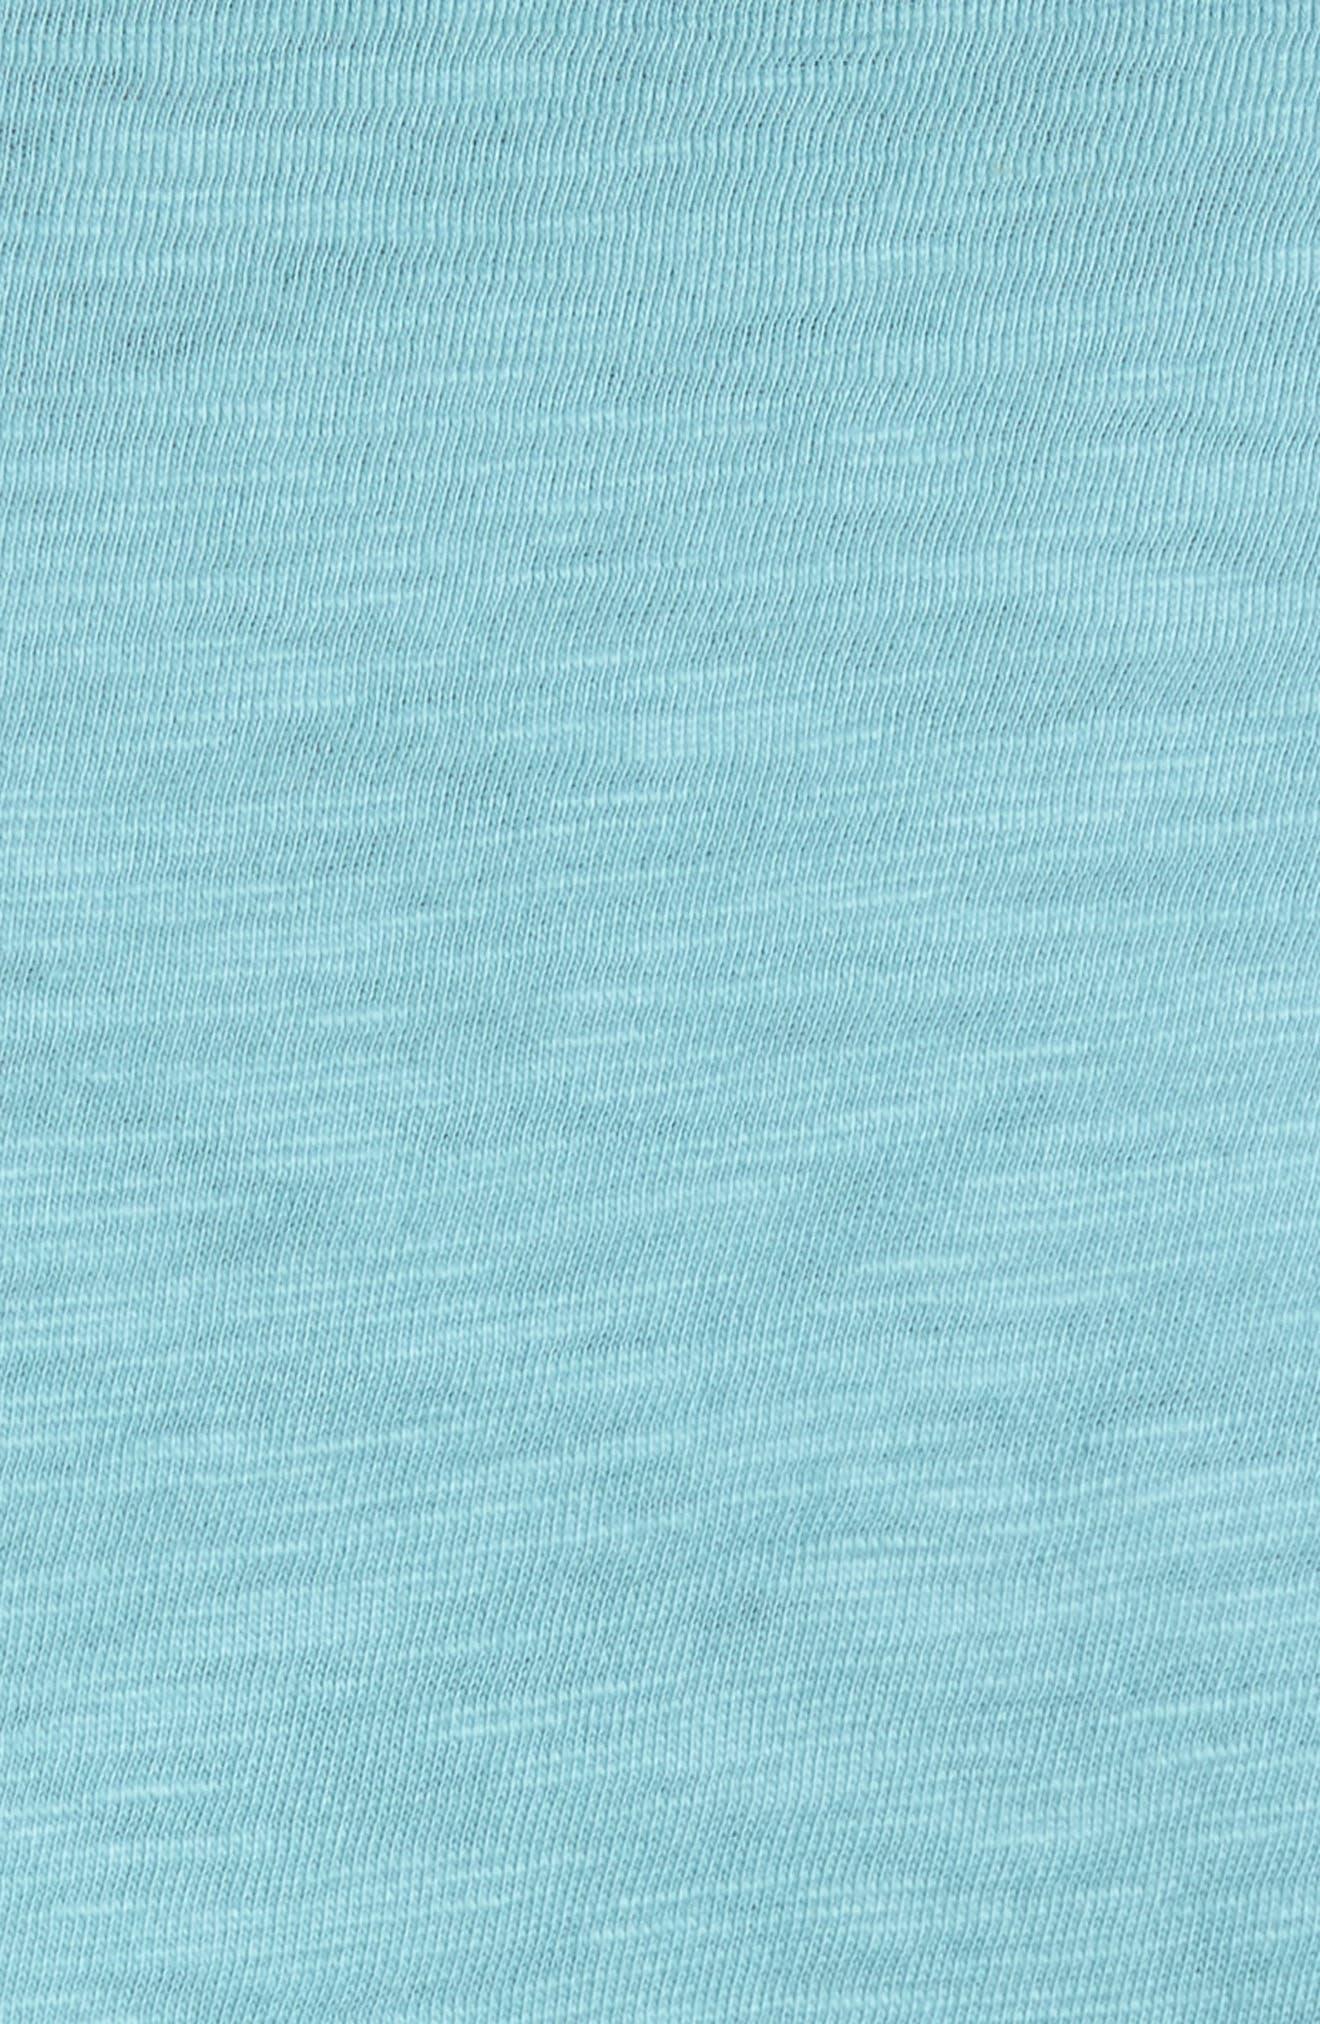 Slim Fit Slub Cotton T-Shirt,                             Alternate thumbnail 5, color,                             Harbor